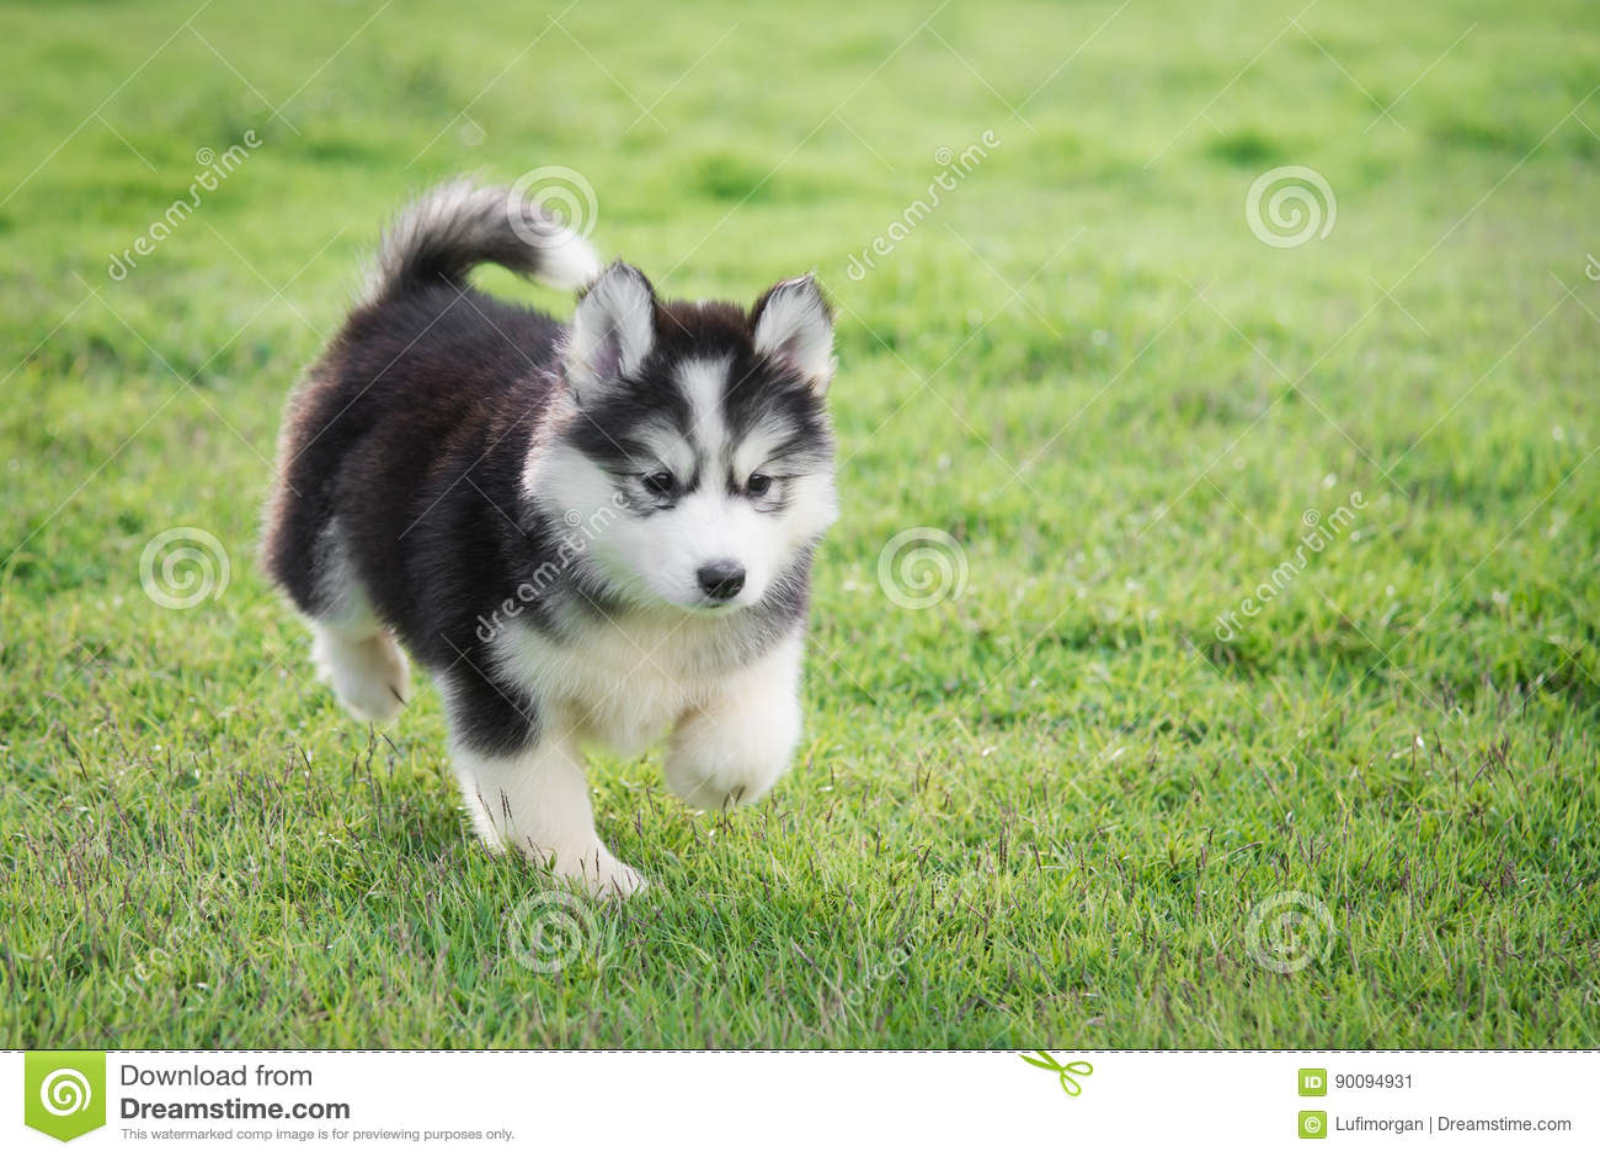 Cute Siberian Husky Puppy Stock Image Image Of Running 90094931